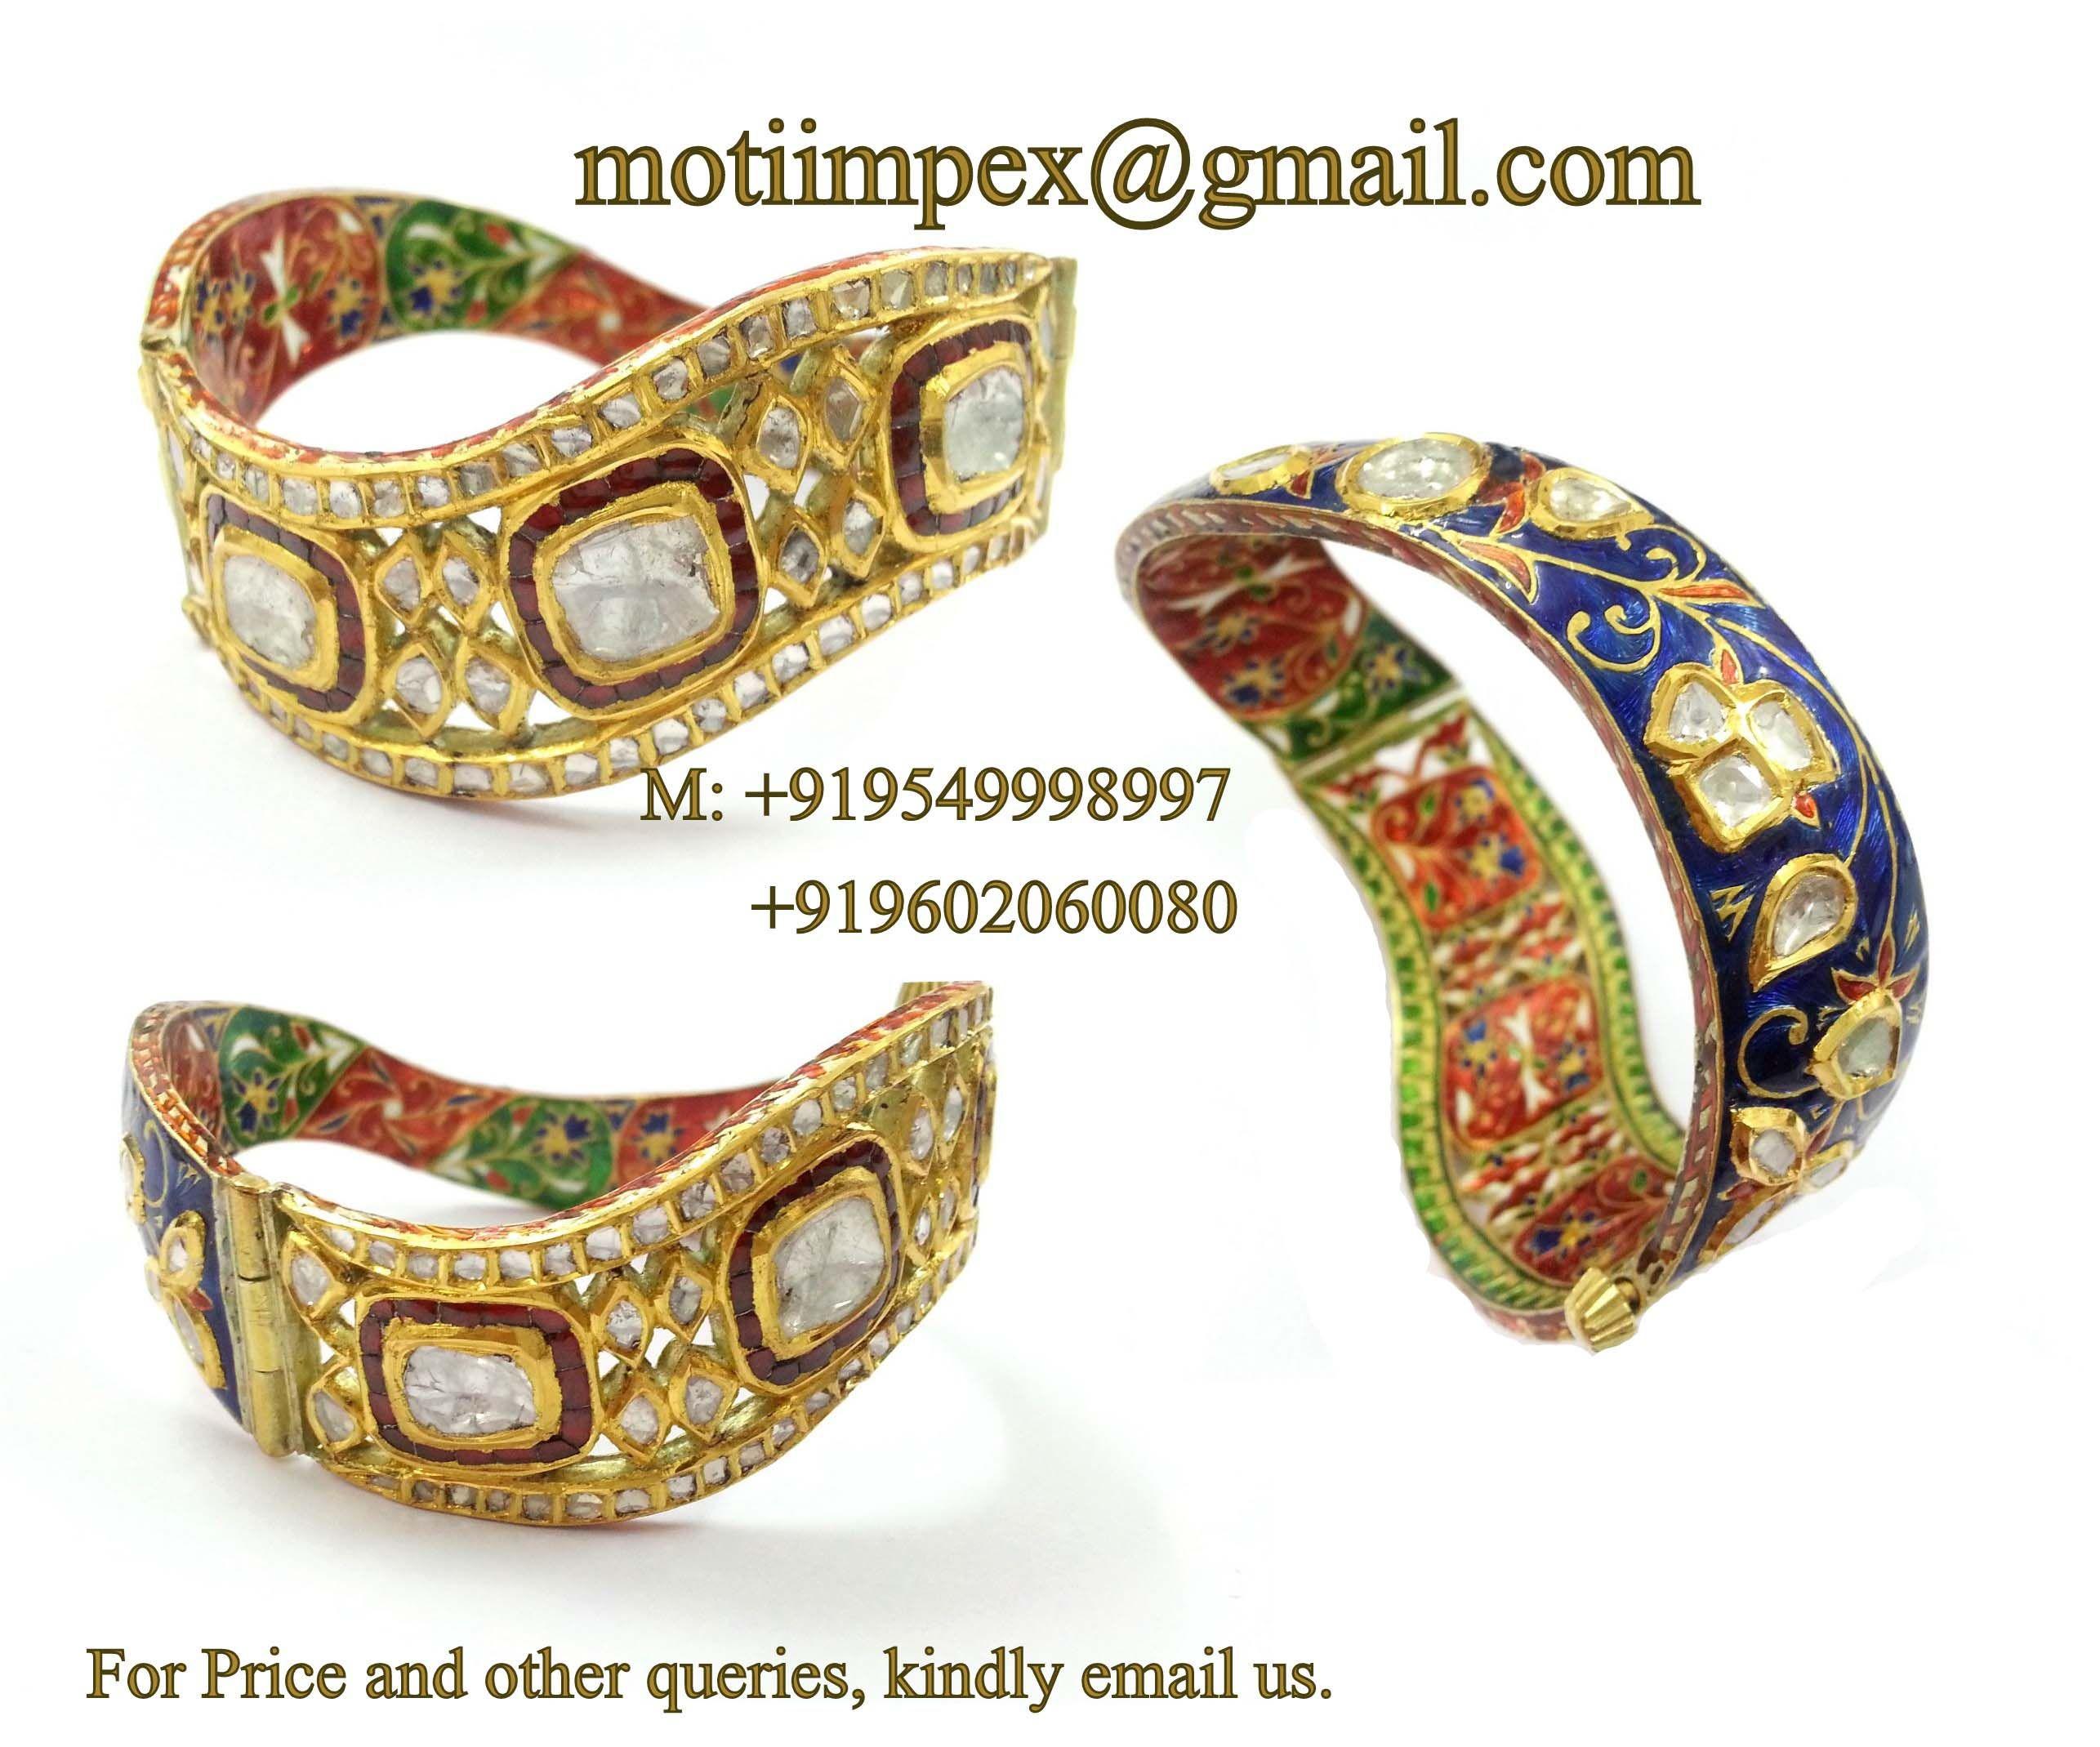 kundan meena jewellery bangles polki rubies in gold by bespoke